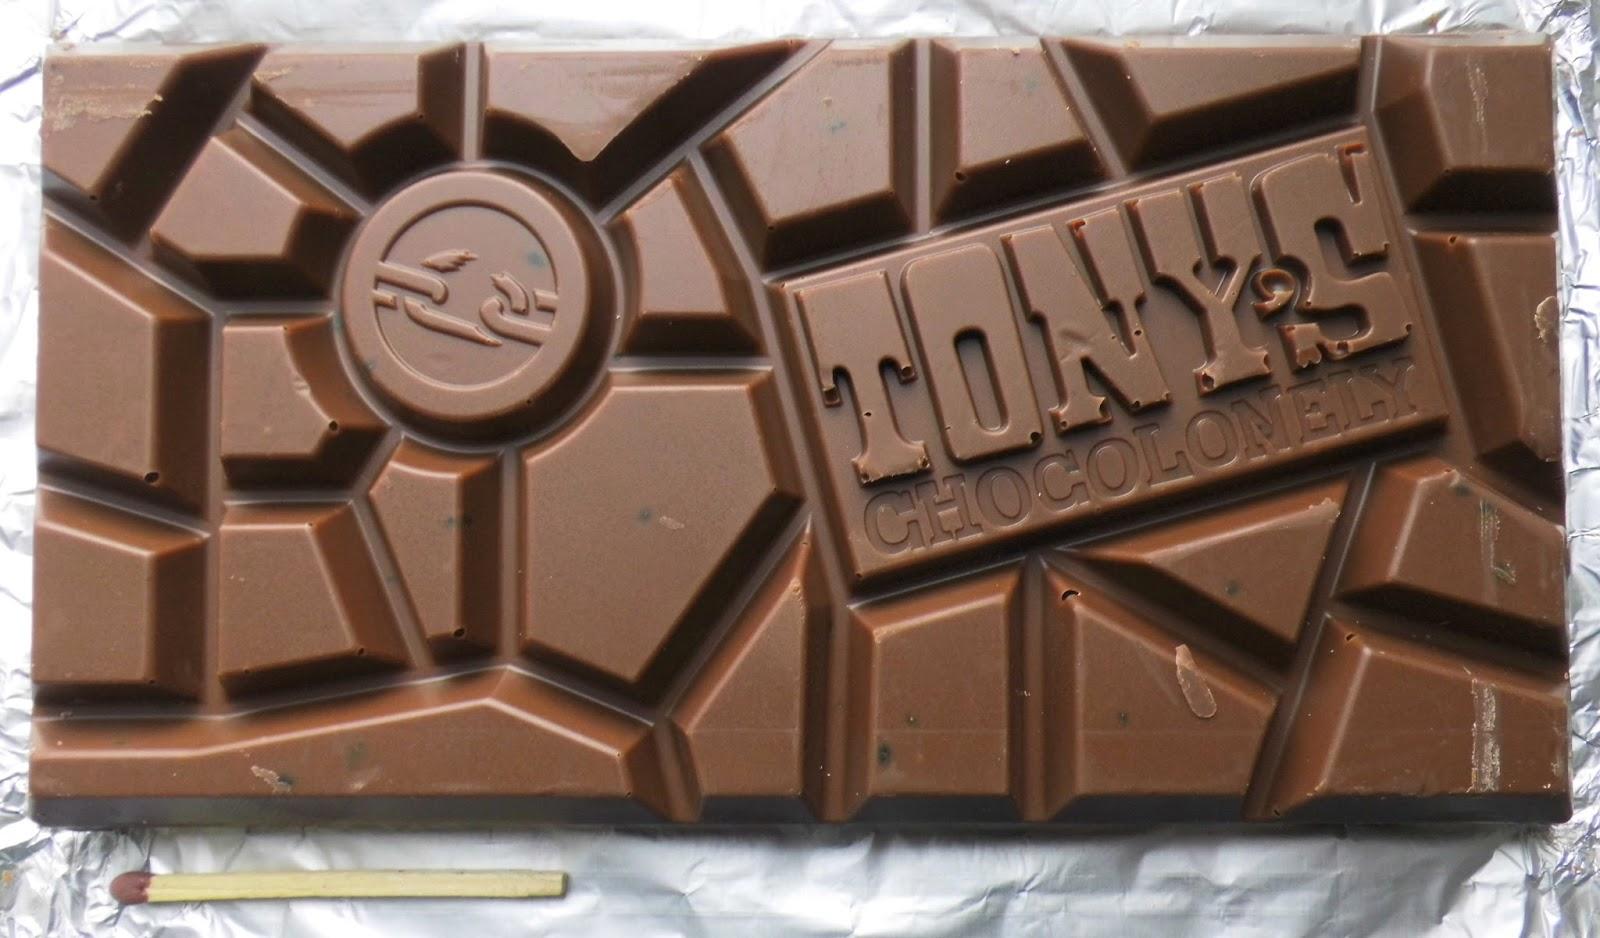 Tony's Chocolonely 'melk drop'